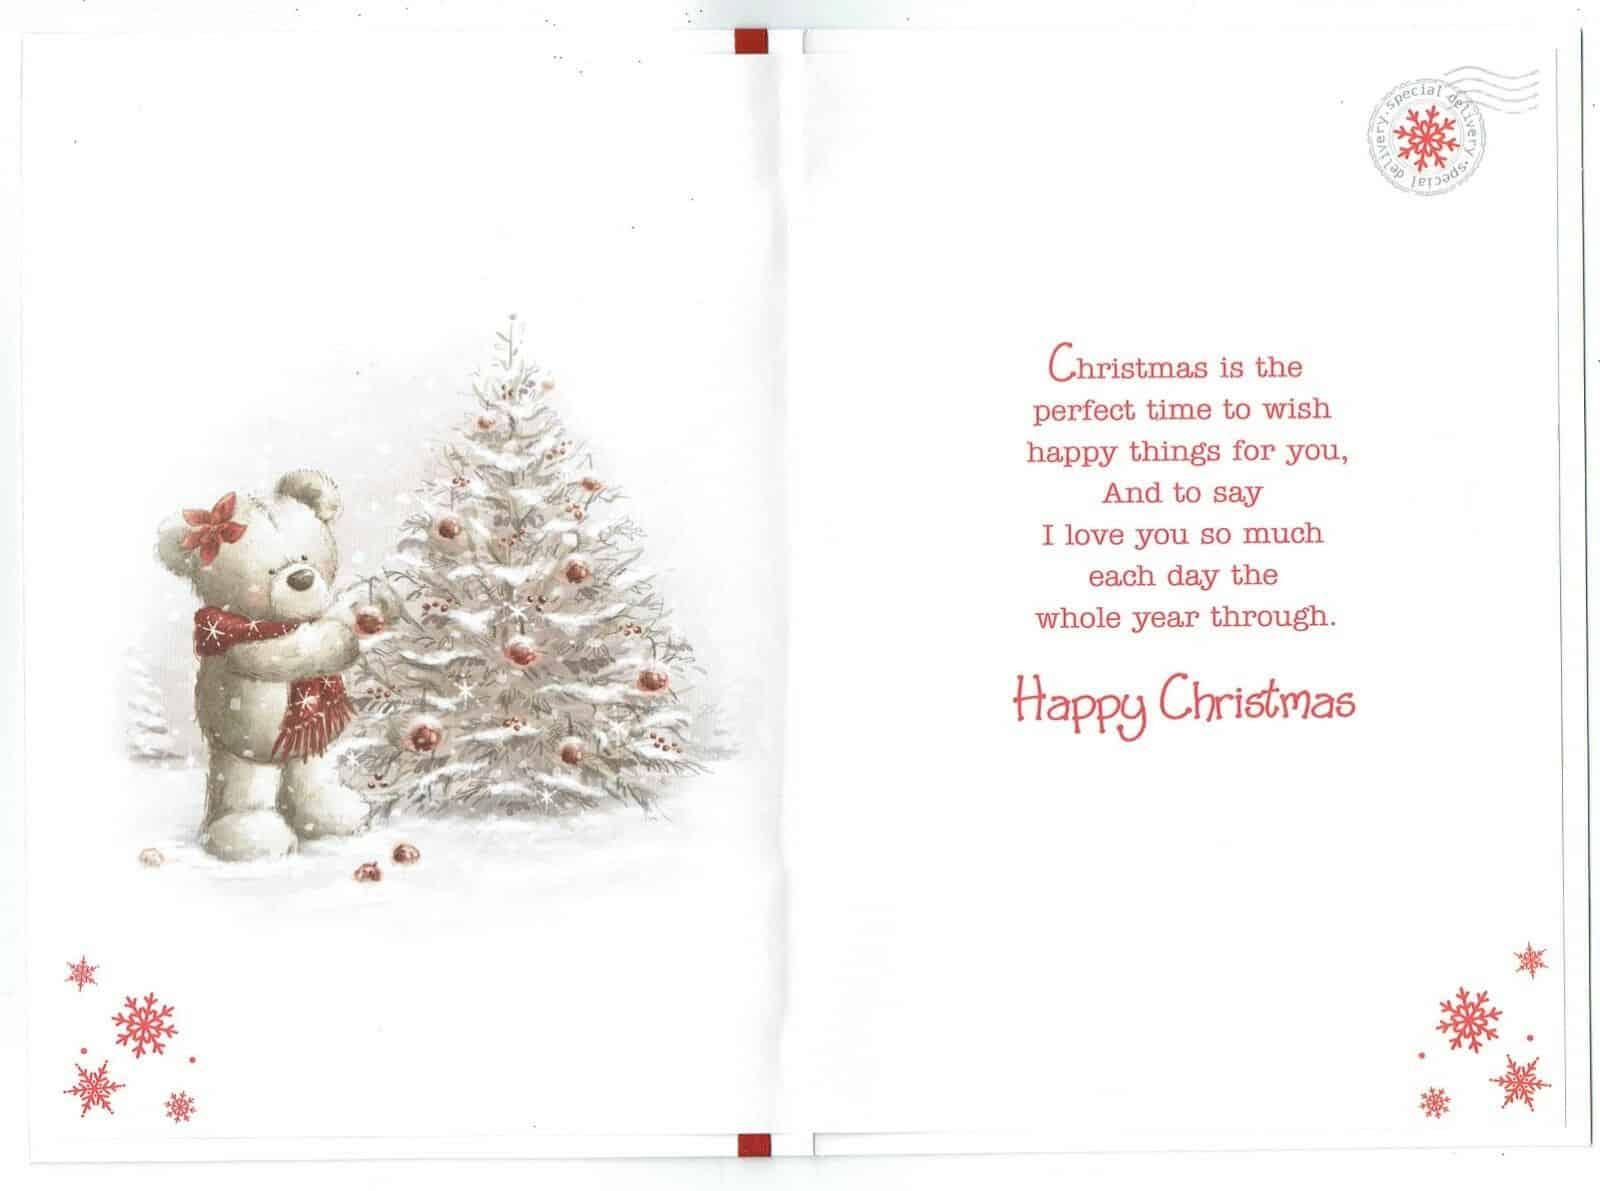 Partner Christmas Card With Festive Bears, Christmas Tree